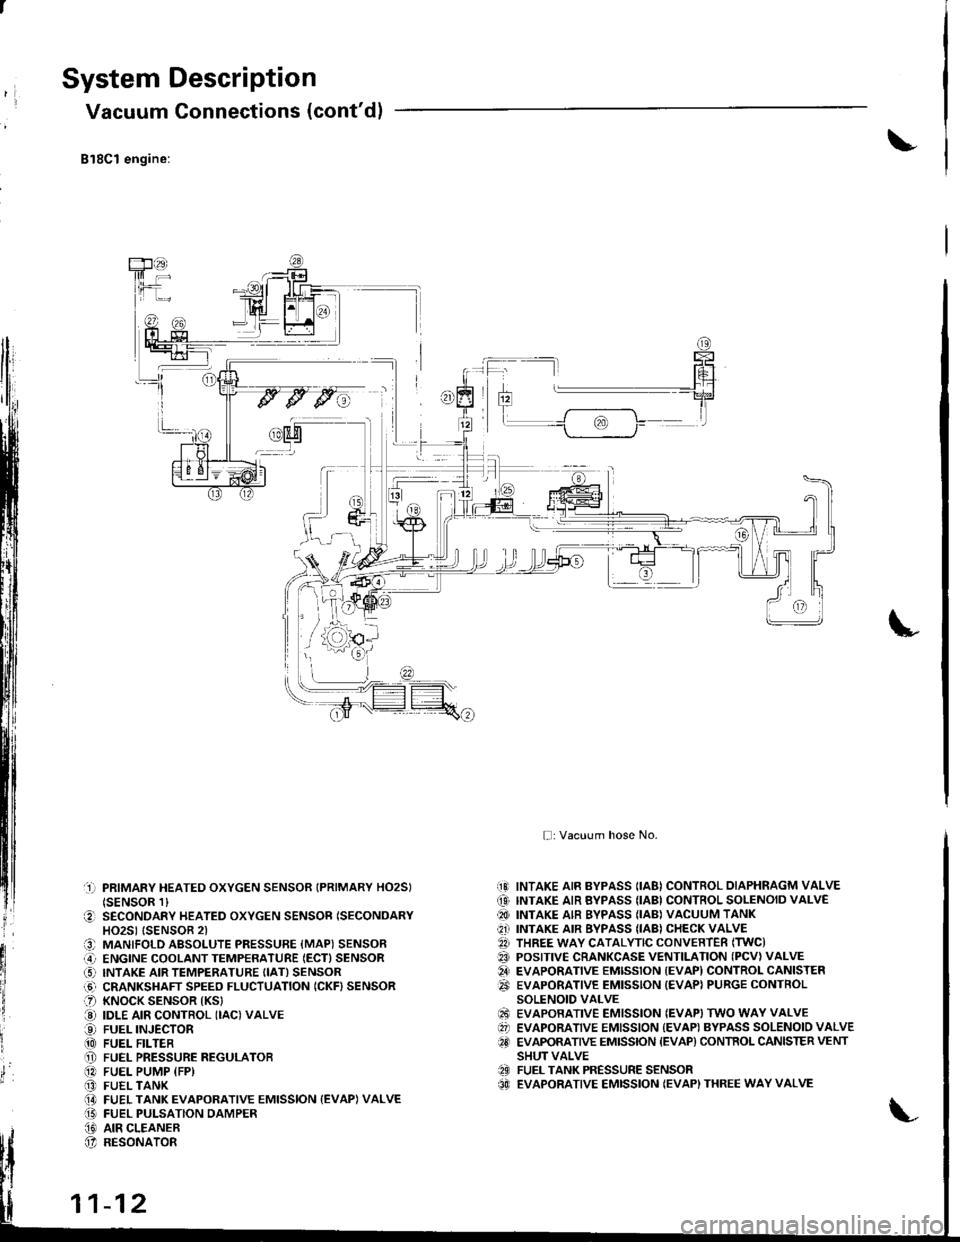 Check Engine Honda Integra 1998 4g Workshop Manual 3 1l Fuel Flow Diagram G Page 217 System Description